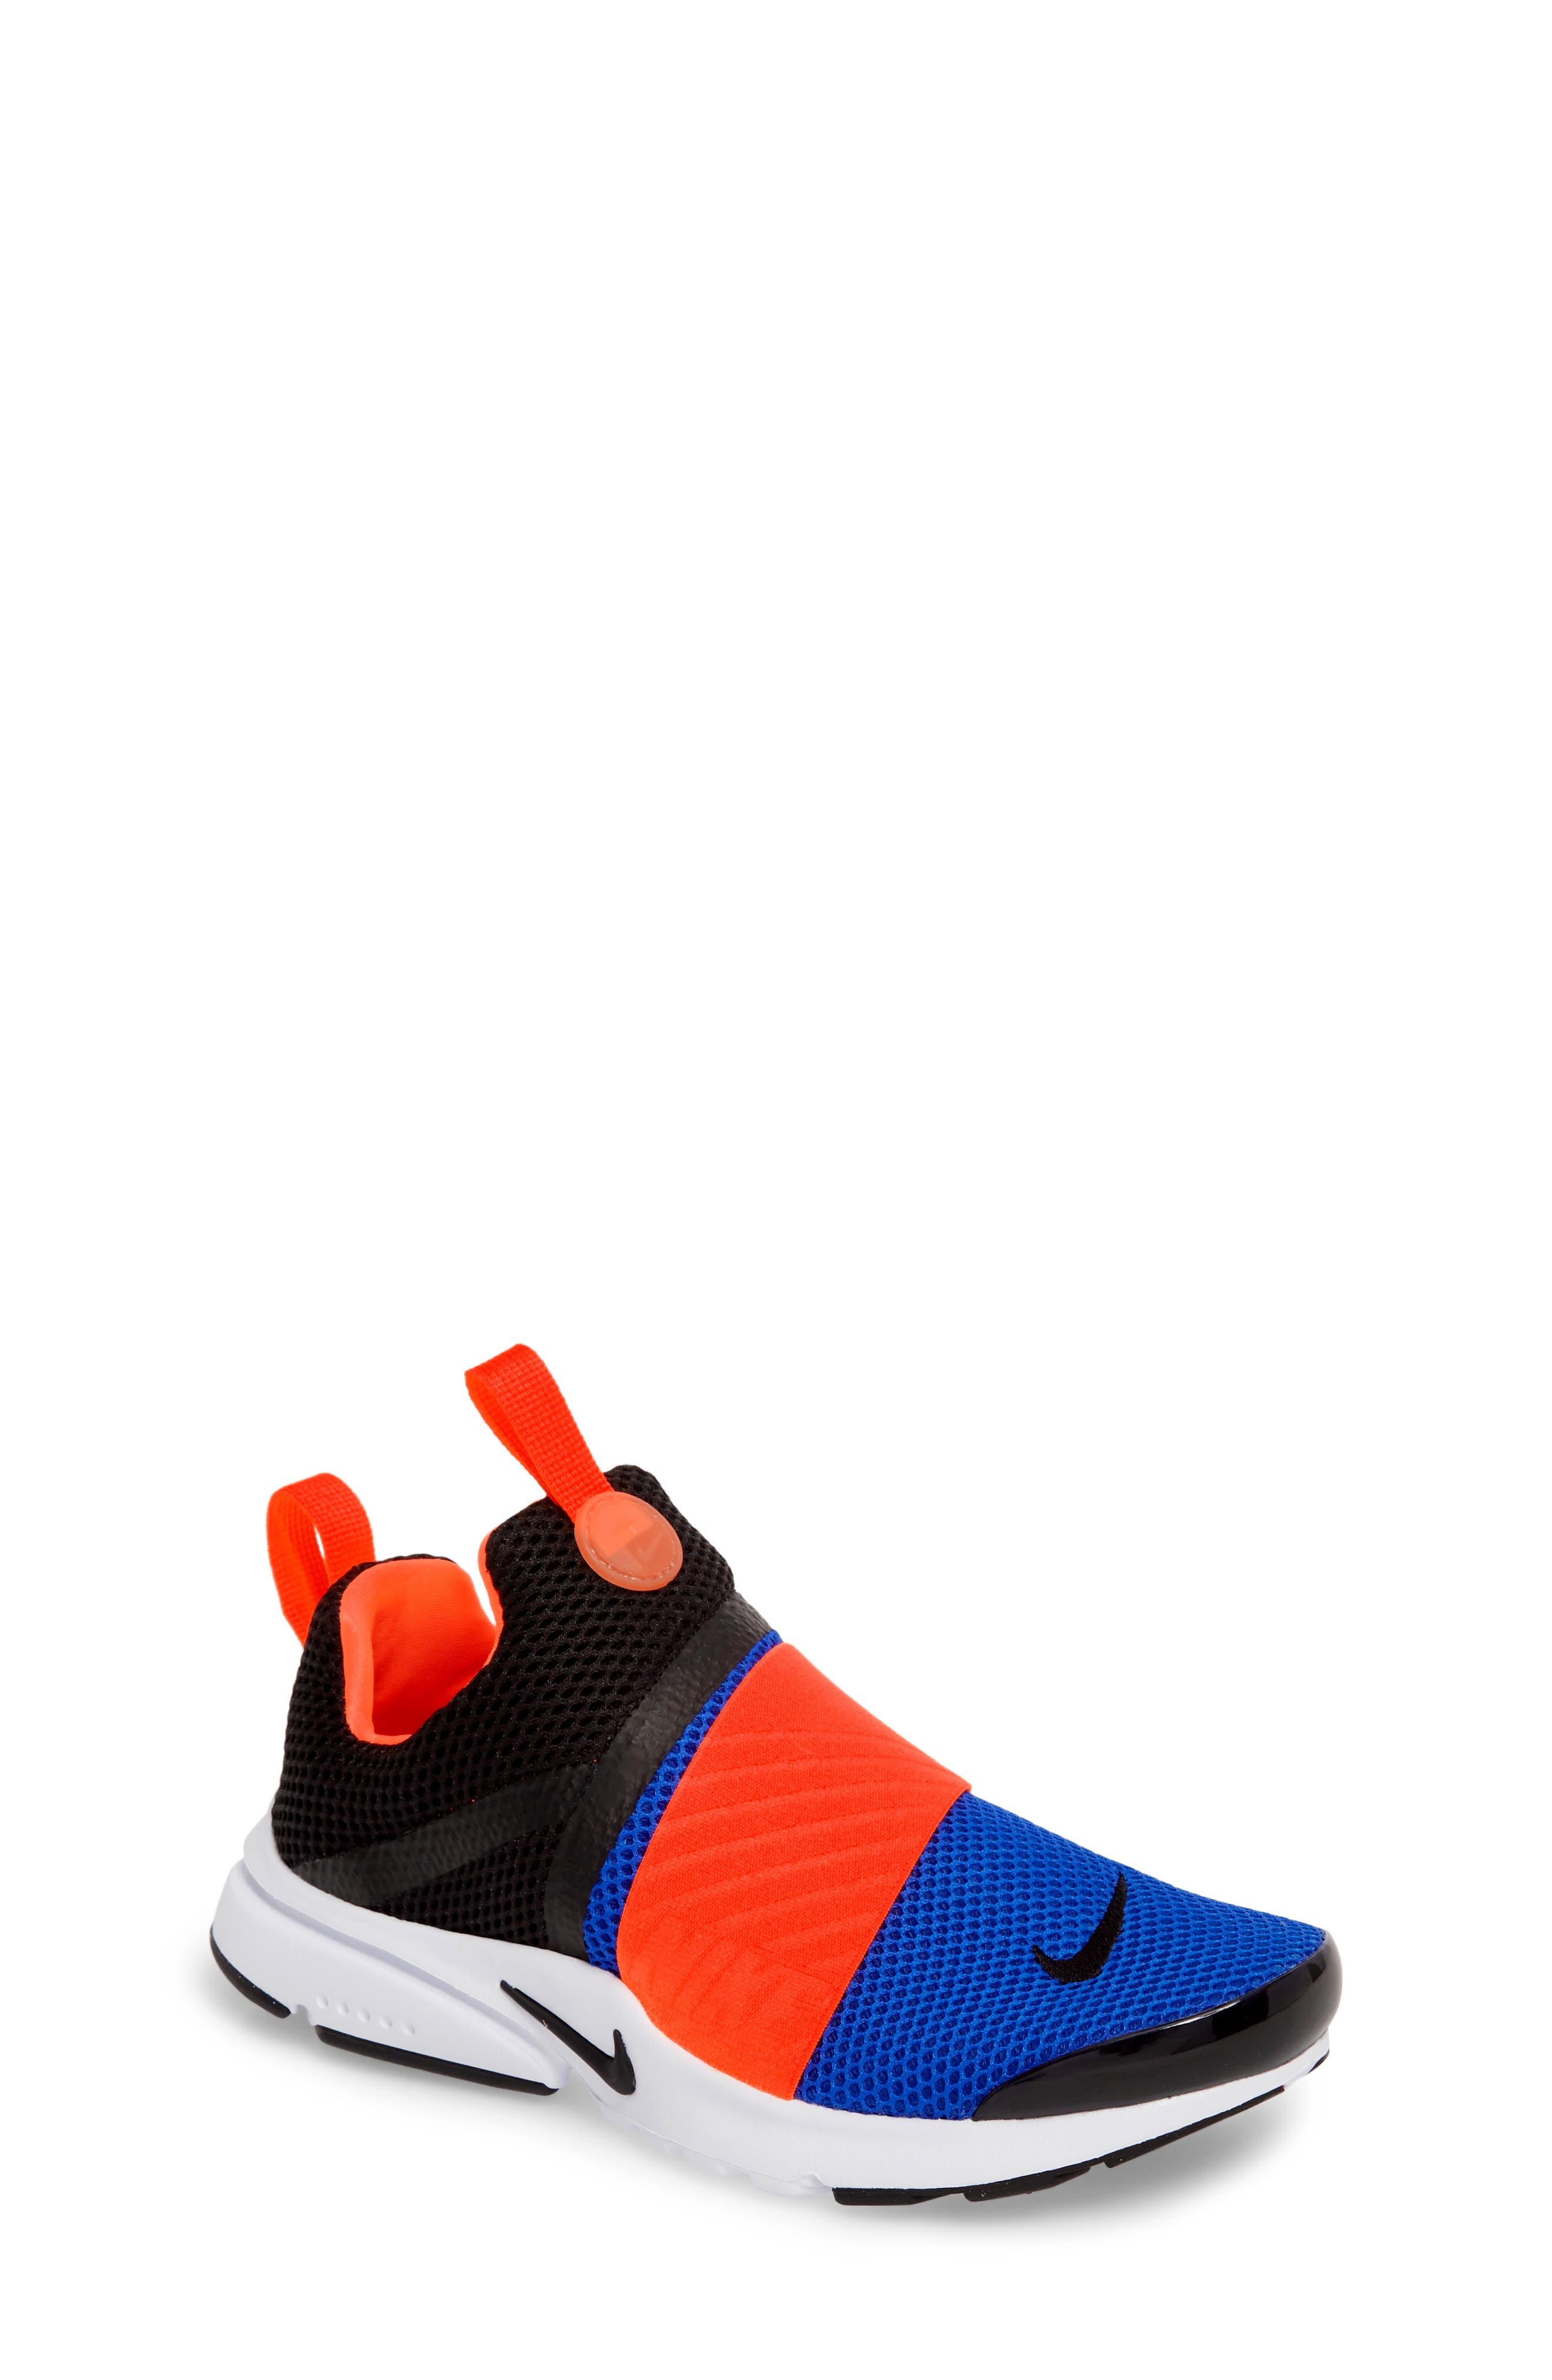 Presto Extreme Sneaker,                             Main thumbnail 1, color,